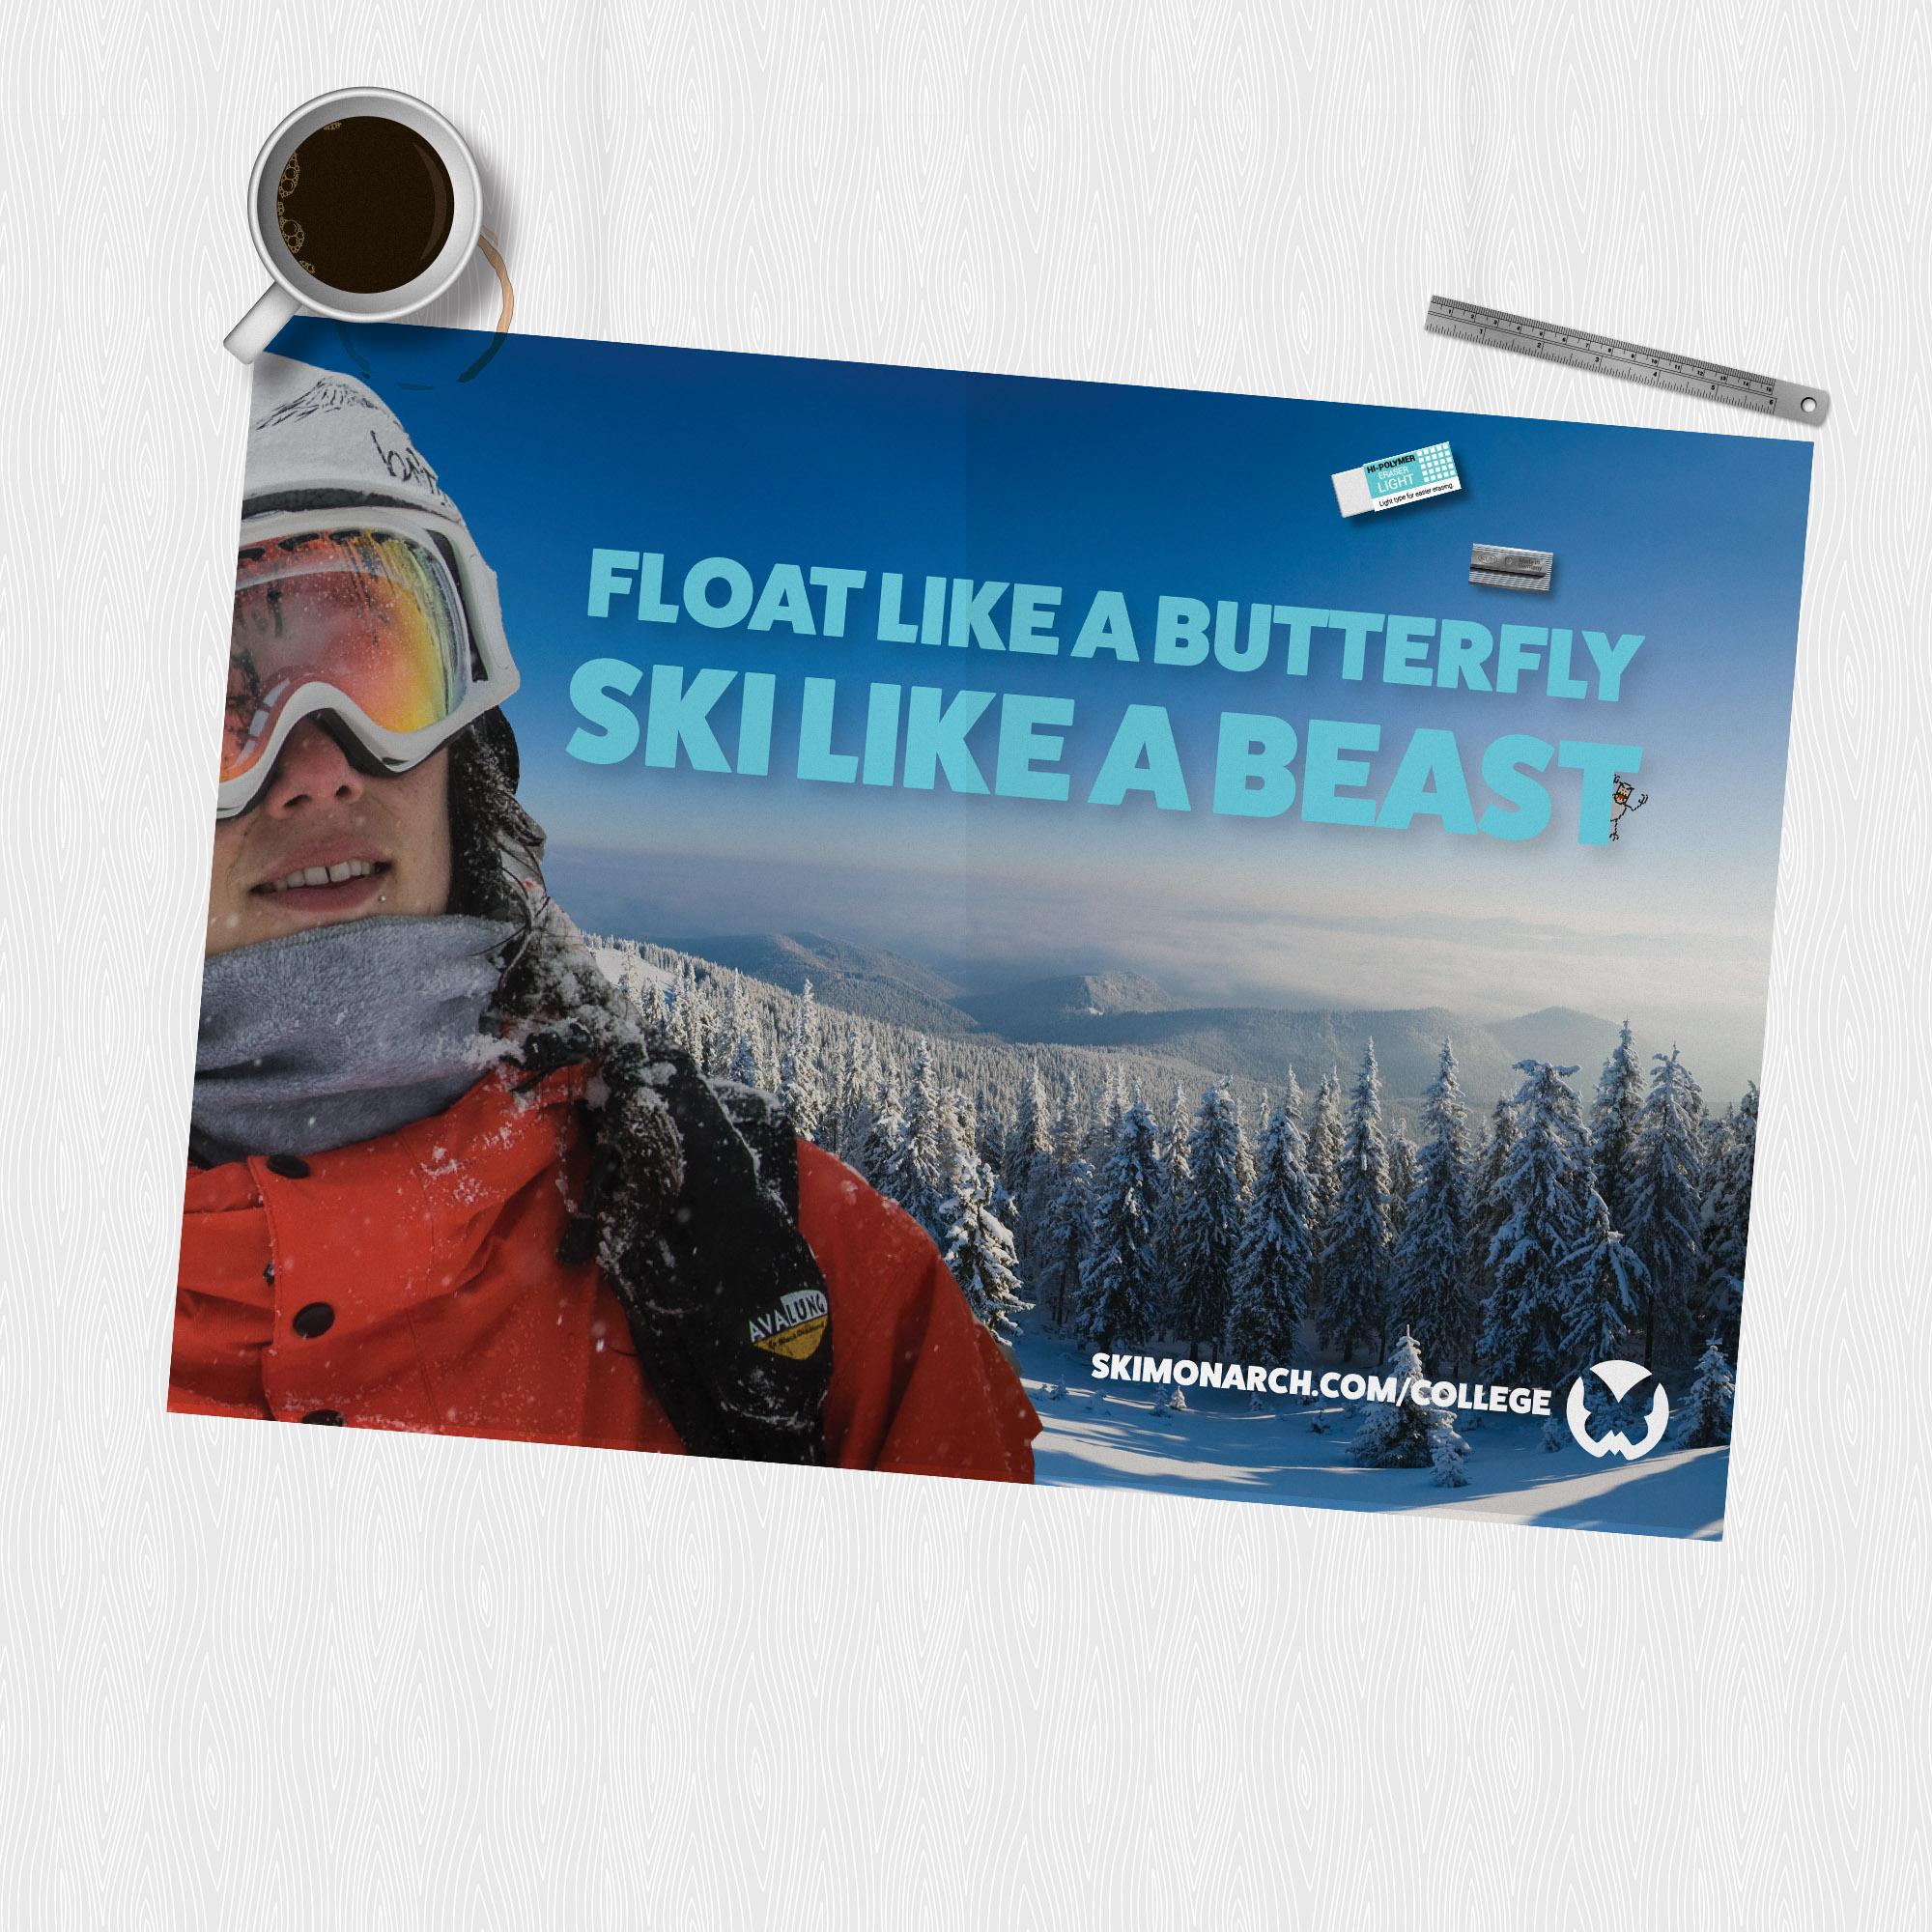 ButterflyMockup.jpg